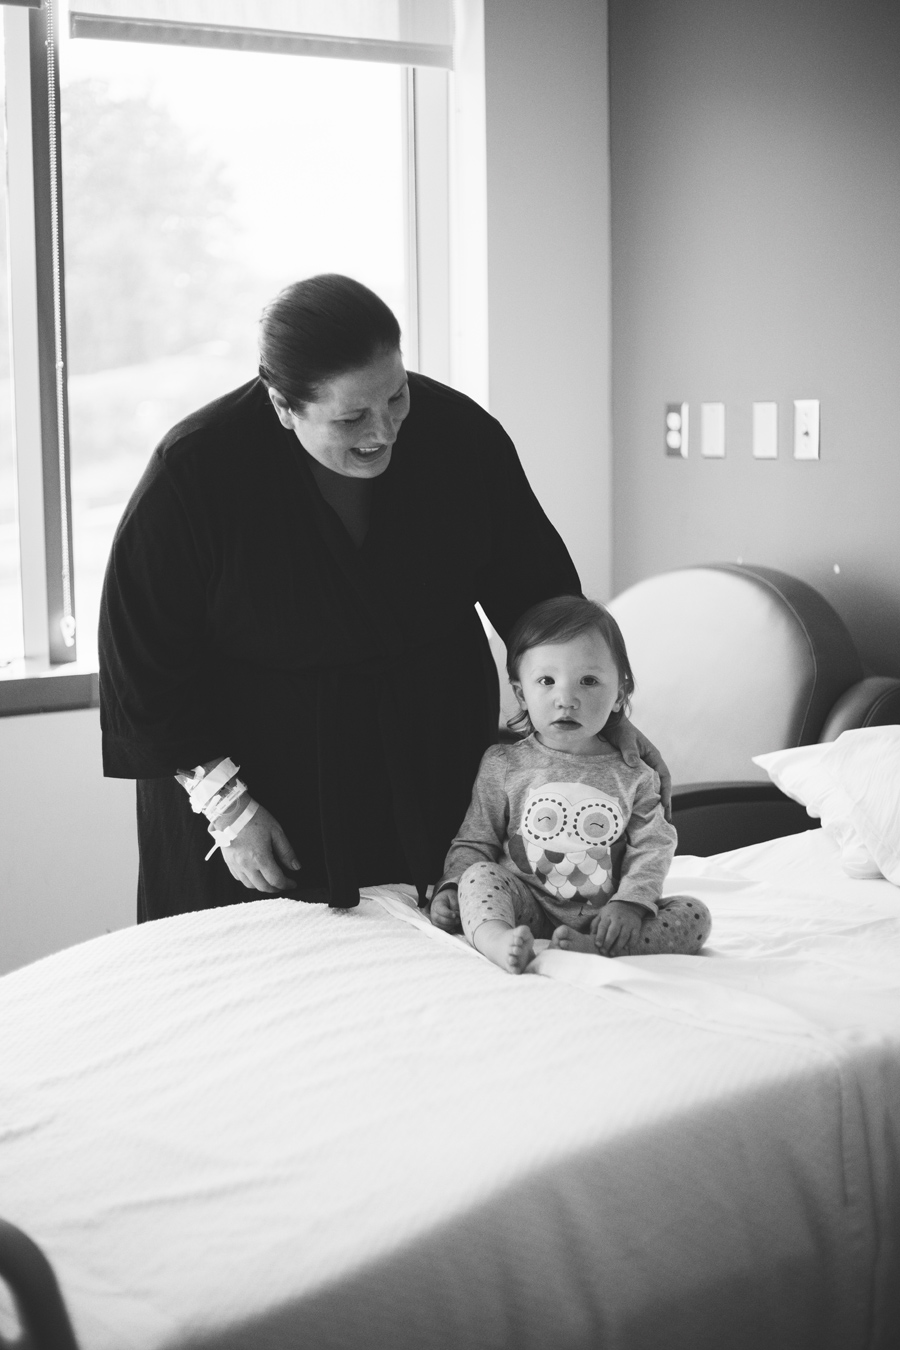 long-island-fresh48-lifestyle-newborn-photo-session-stony-brook-hospital-port-jefferson-suffolk-county-new-york